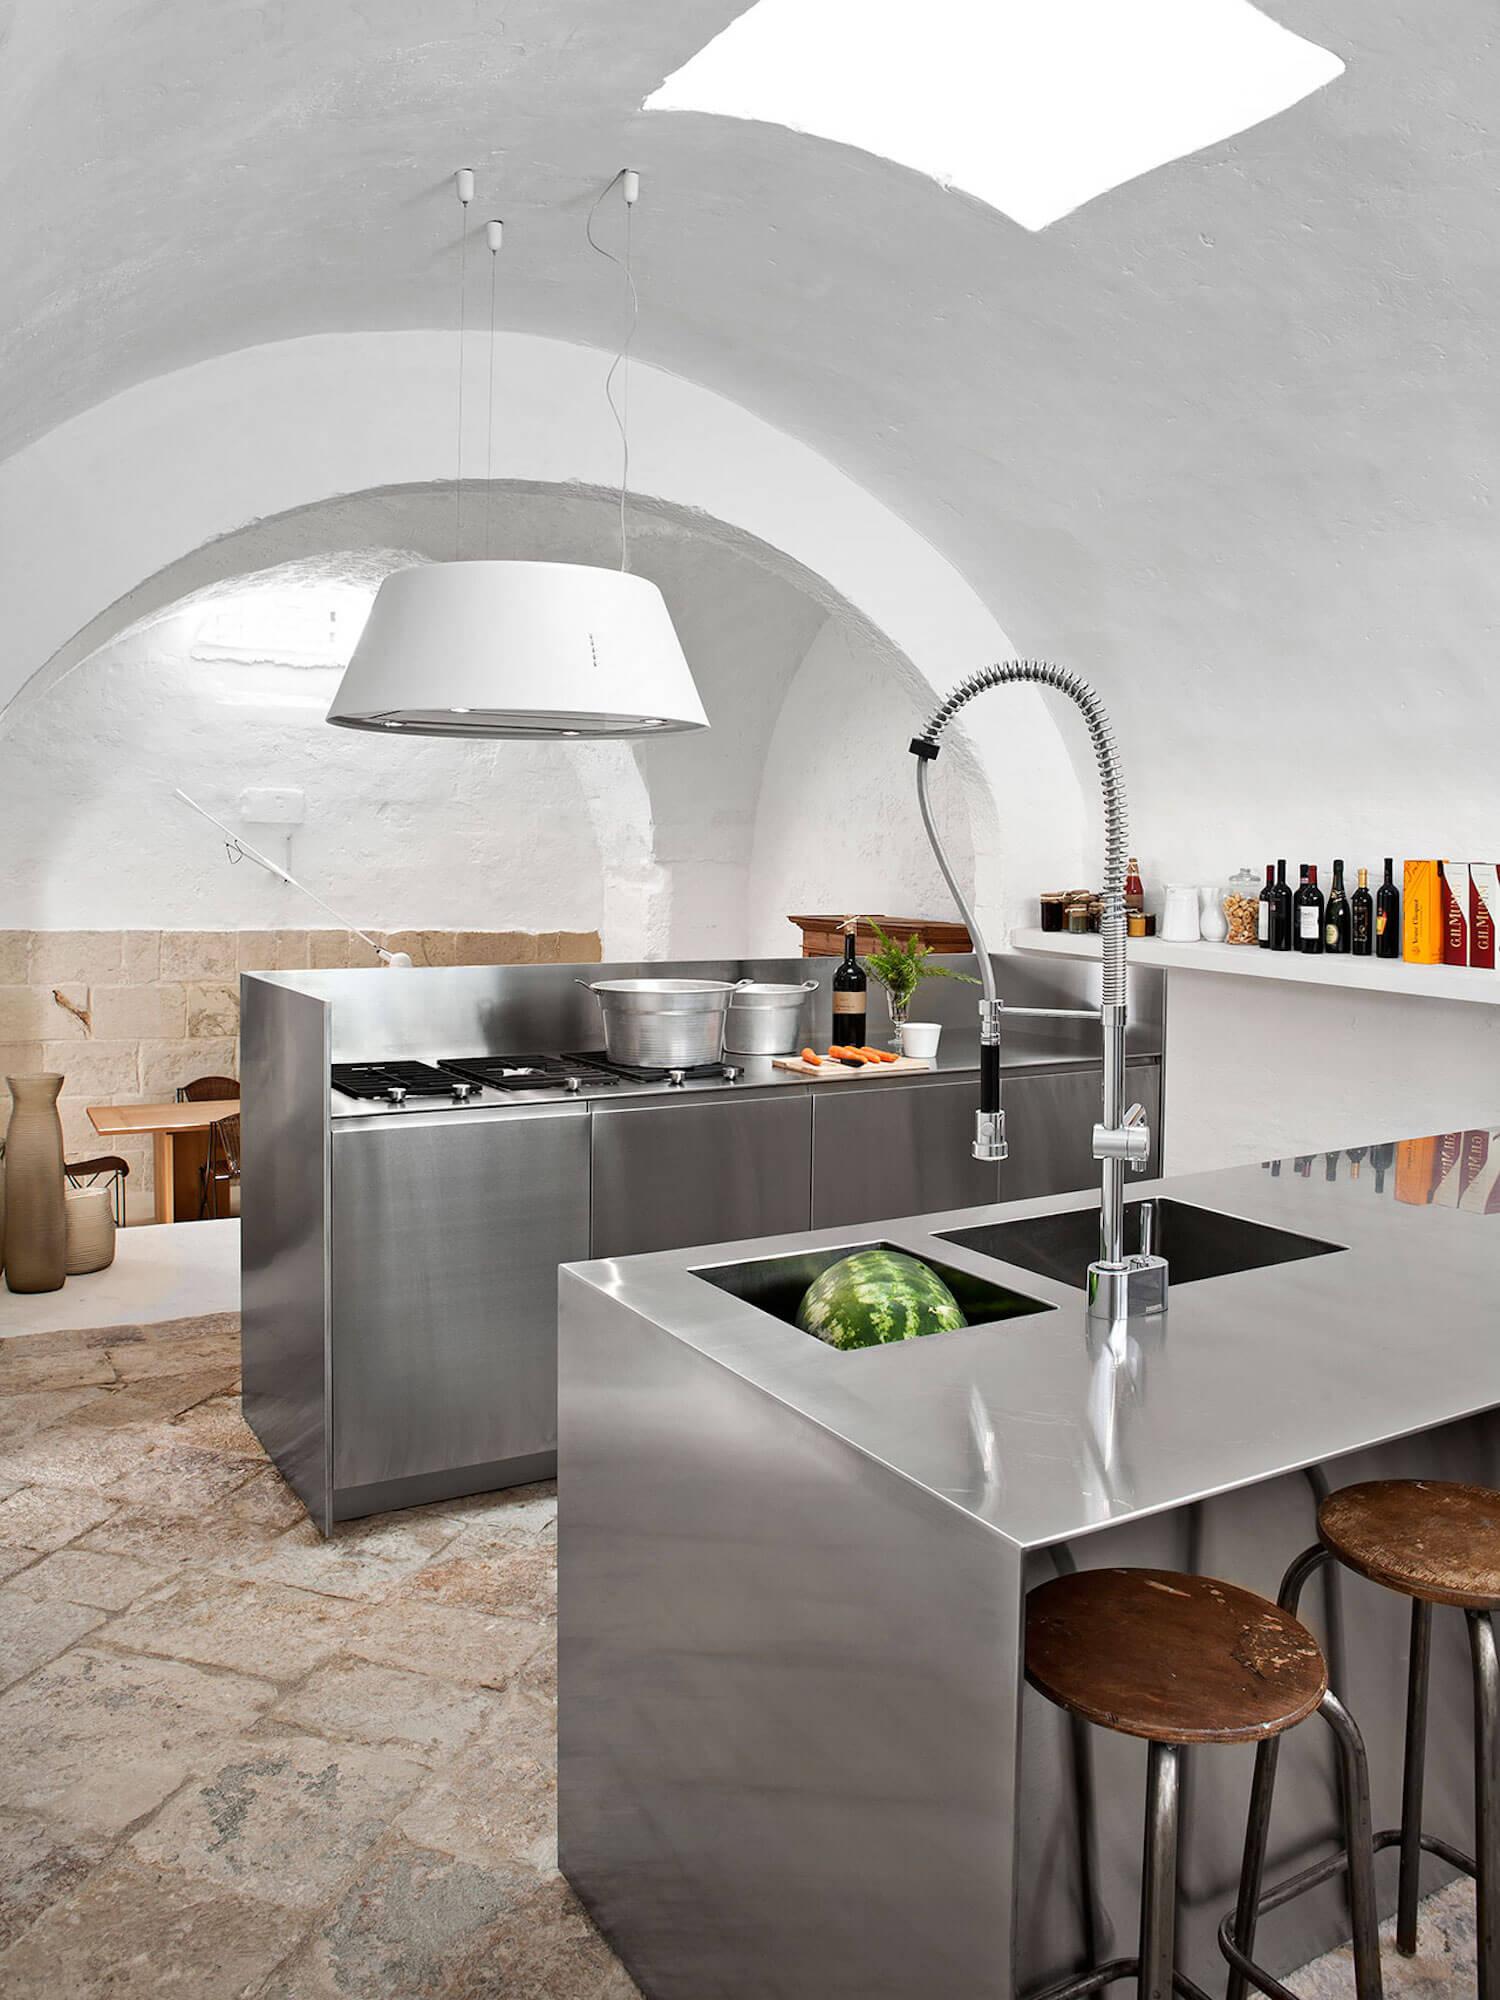 est living an italian country house palomba serafini 10